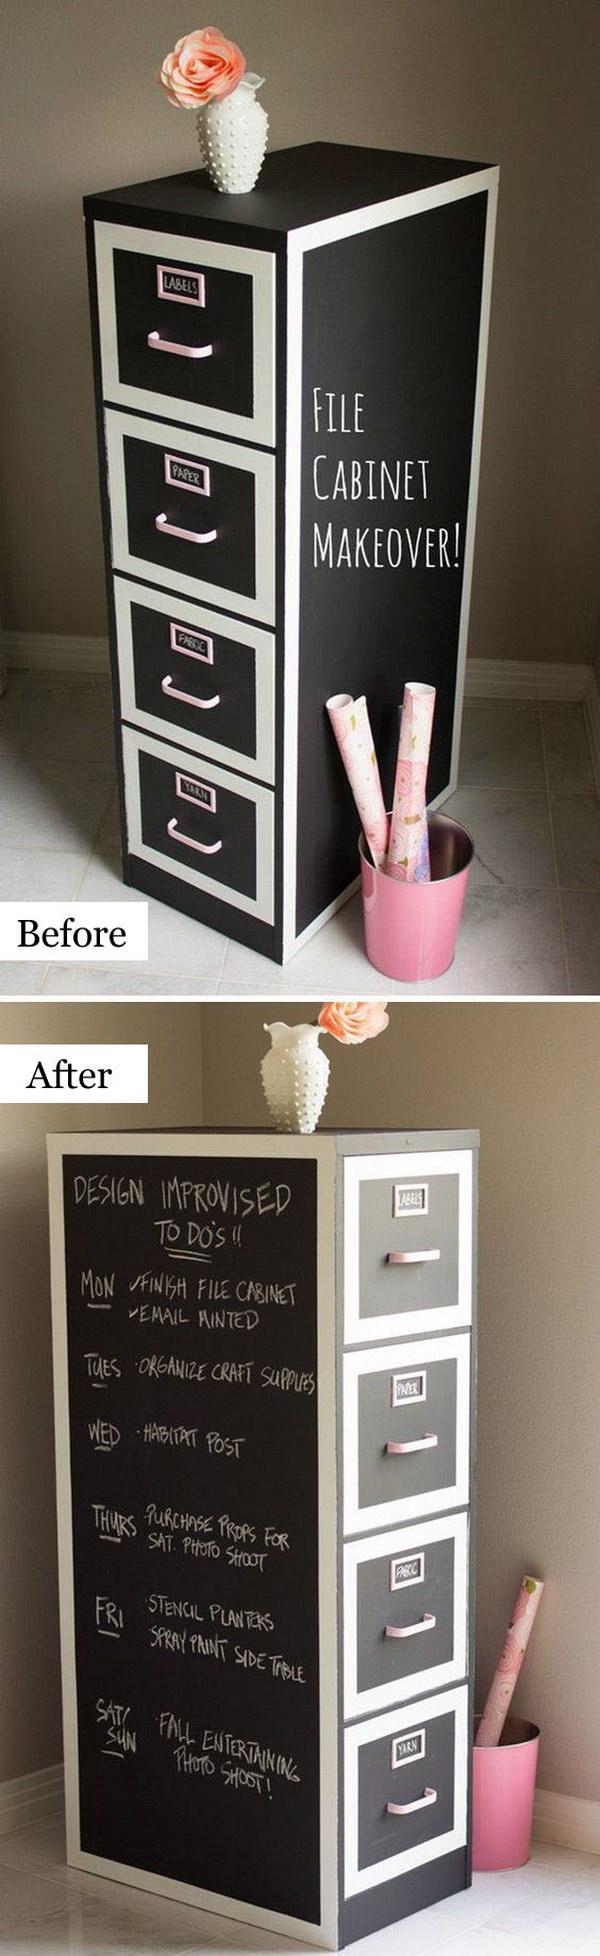 File Cabinet Makeover.